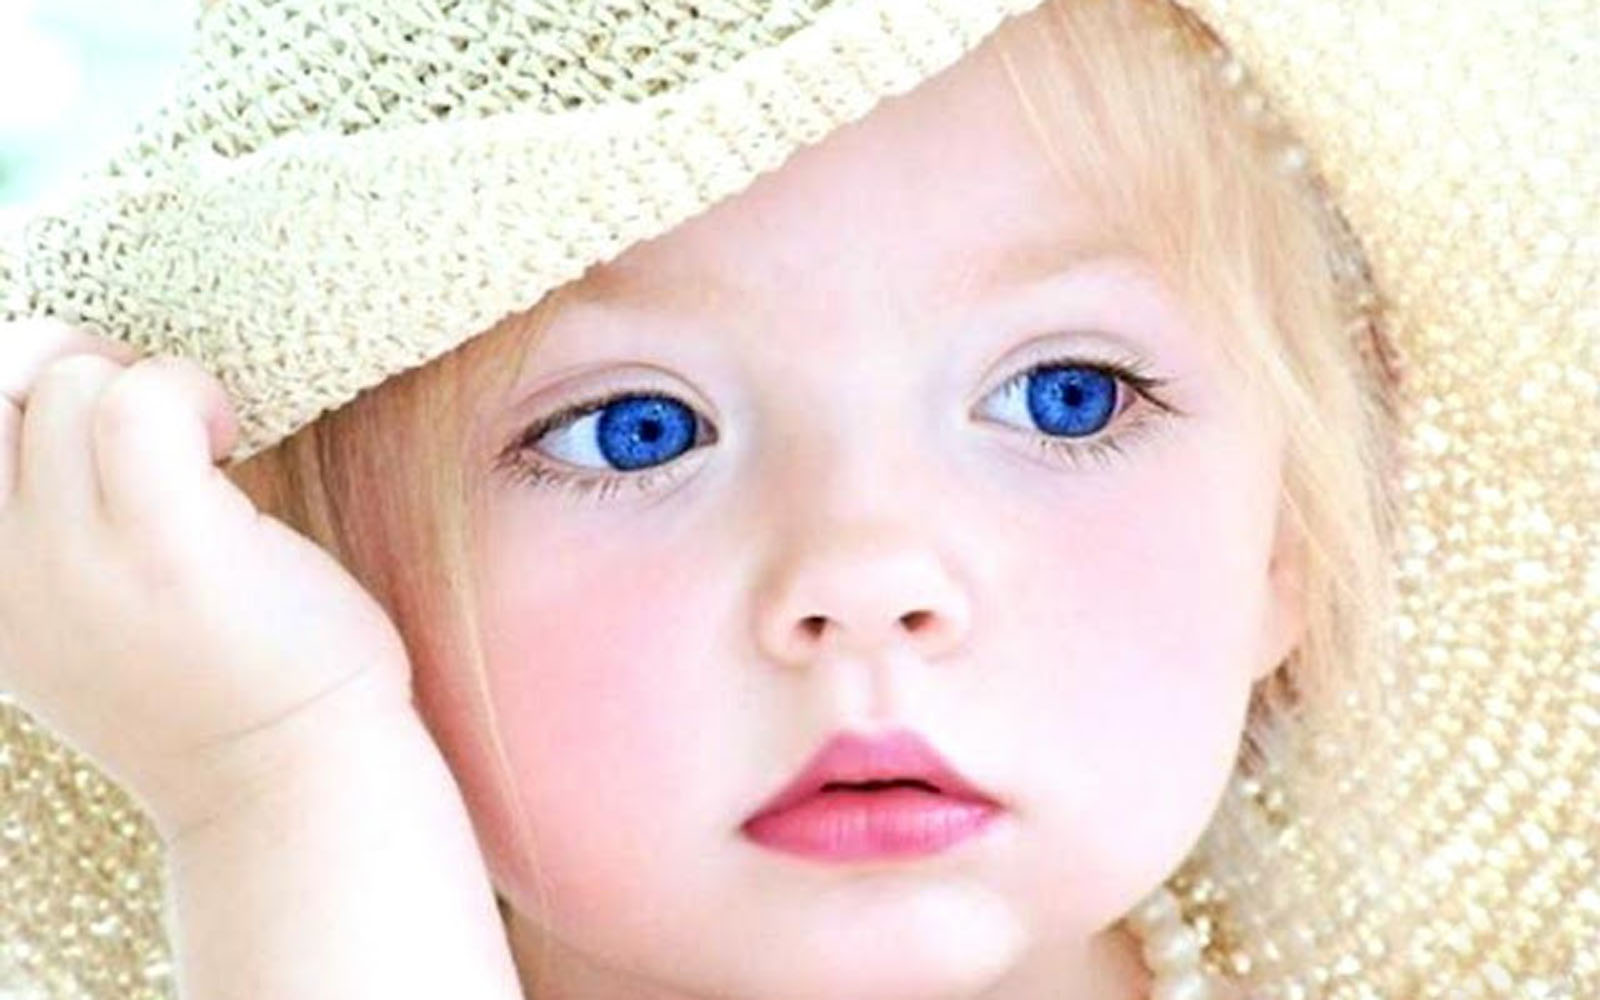 Cute Baby Wallpapers Hd: Wallpapers: Cute Babies Hd Wallpapers